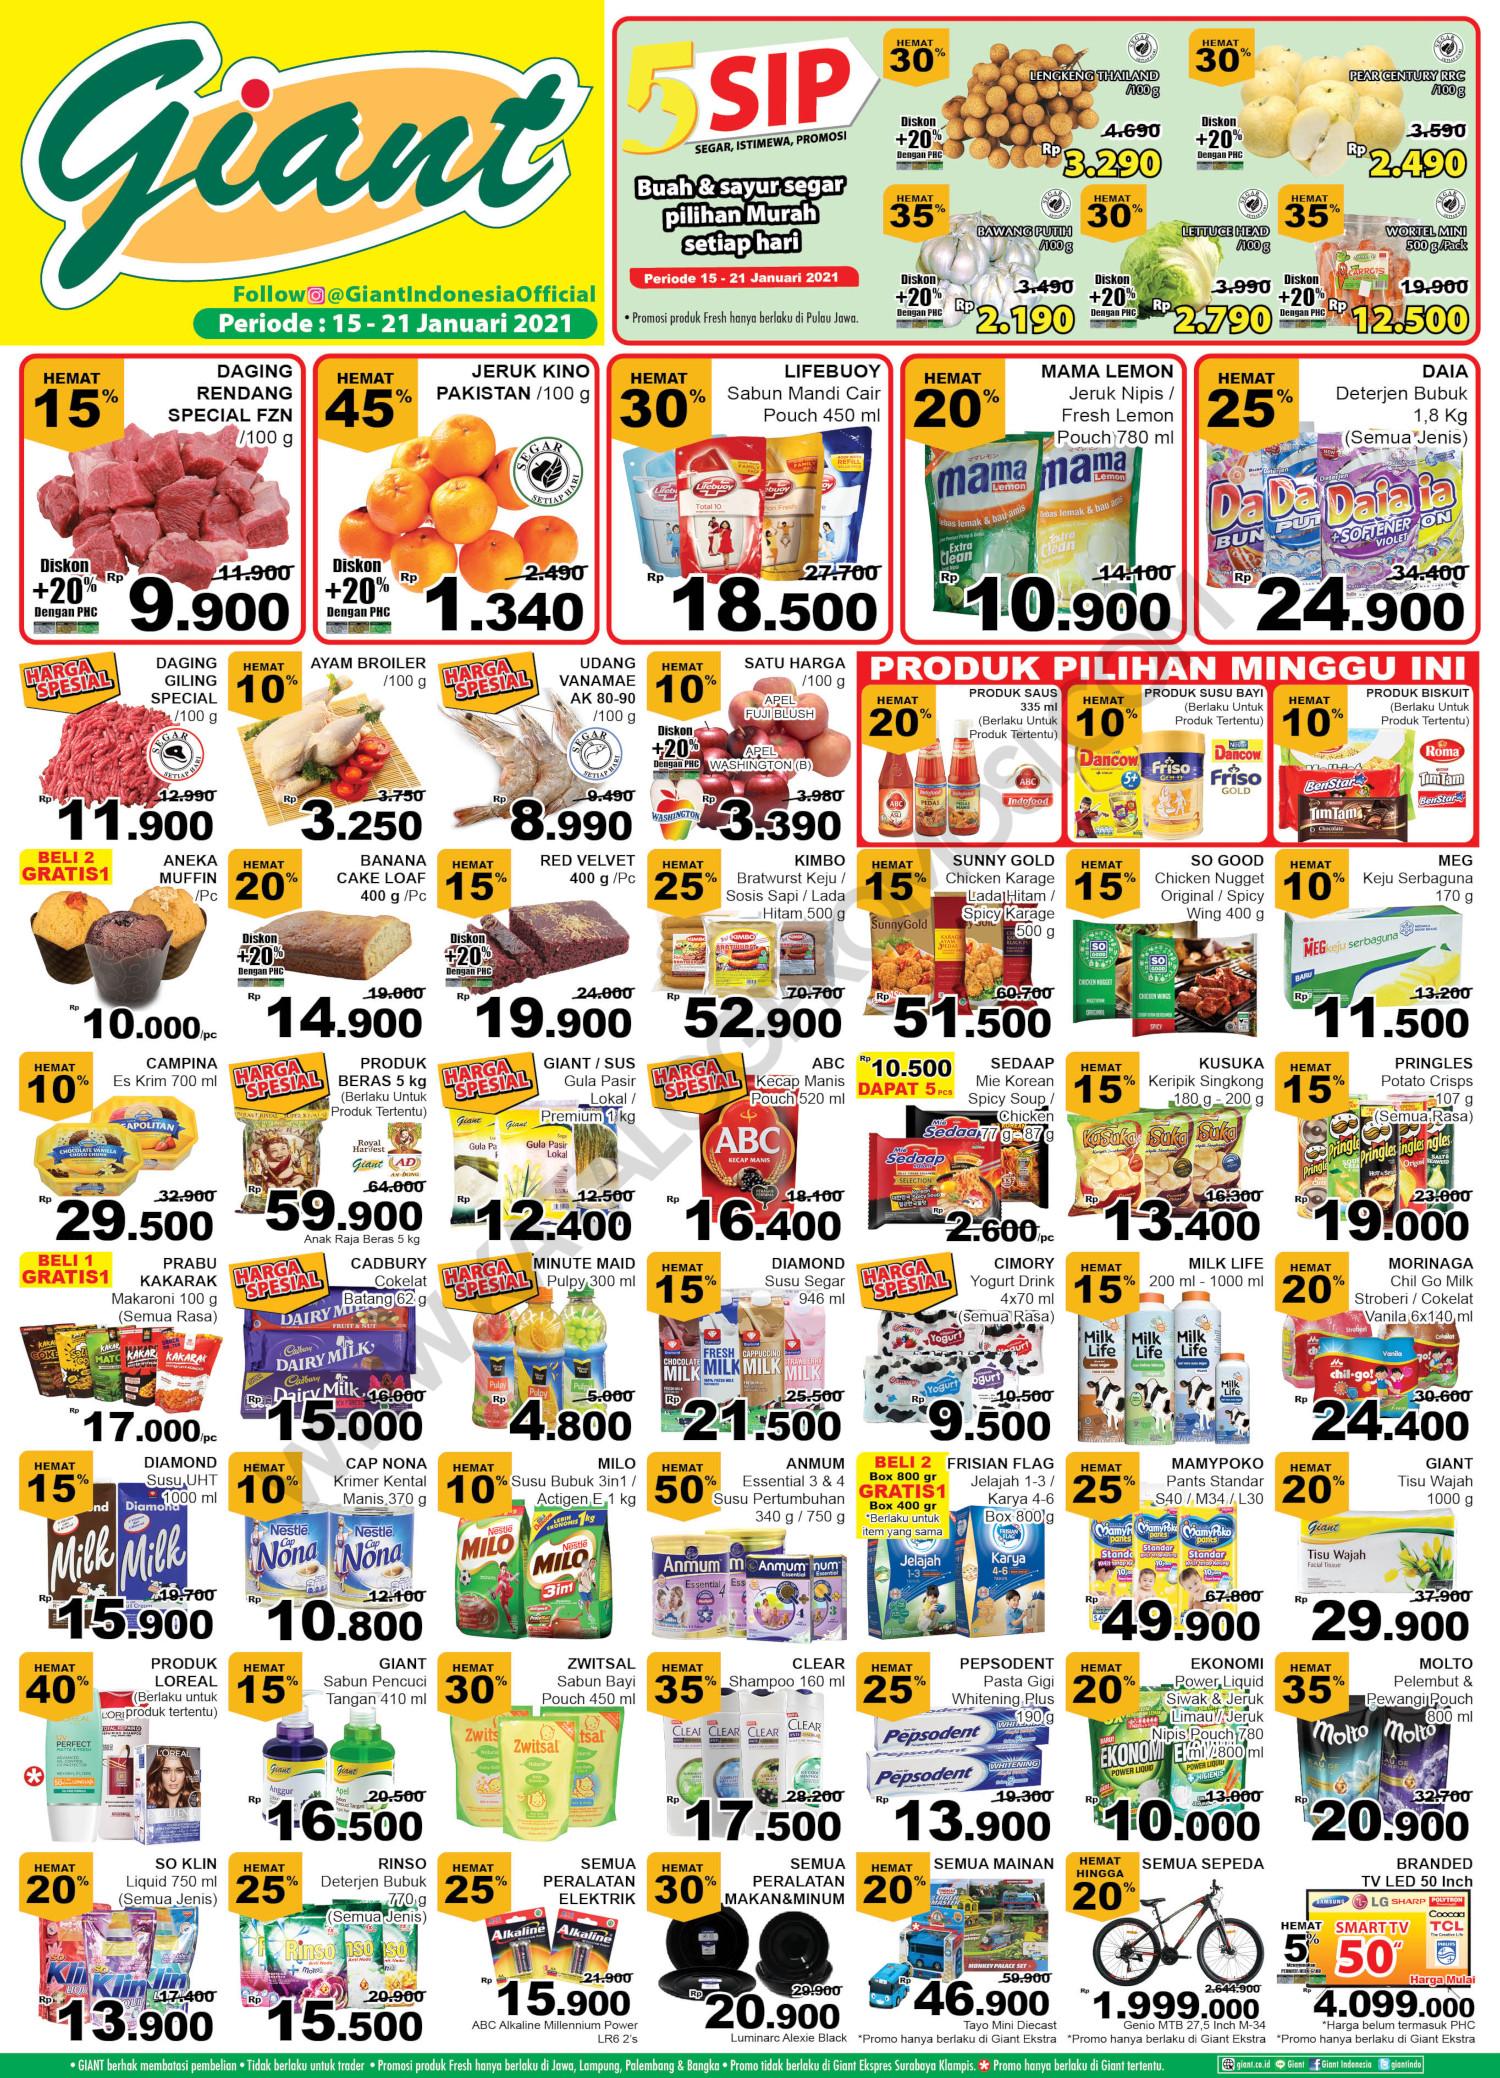 Promo Giant JSM Katalog Weekend periode 15-21 Januari 2021